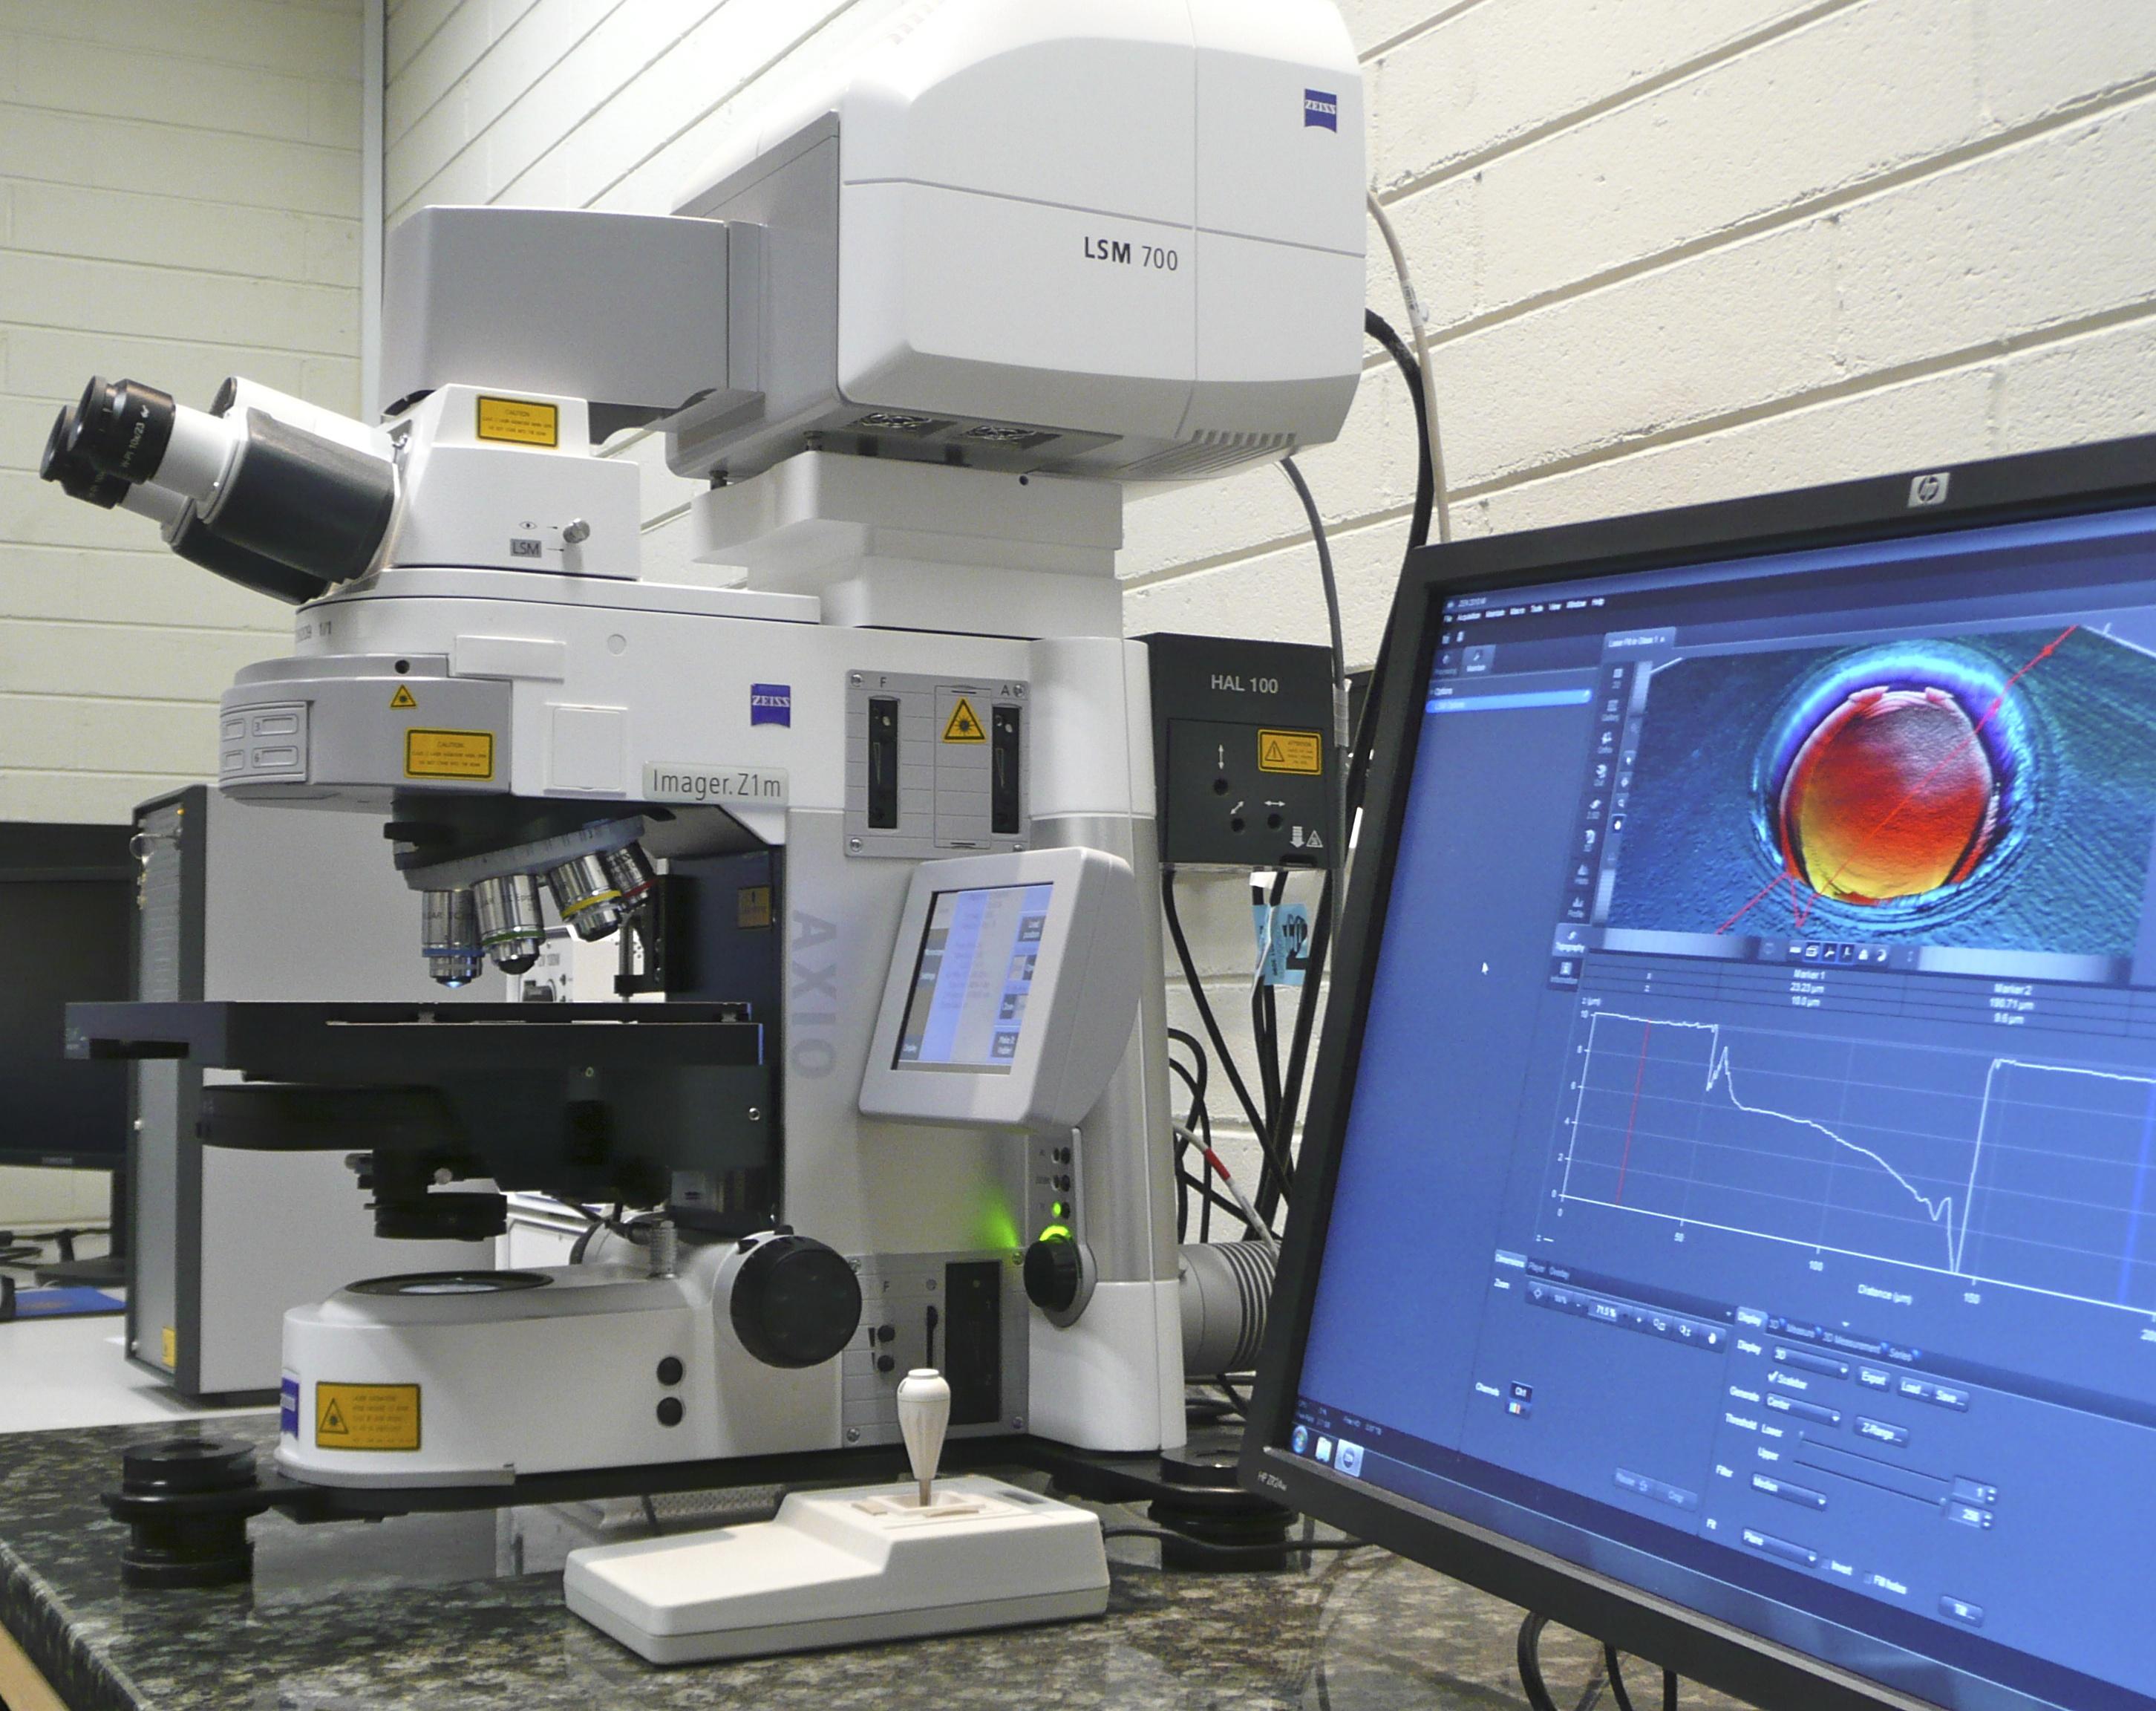 Zeiss Z1m Microscope with LSM700